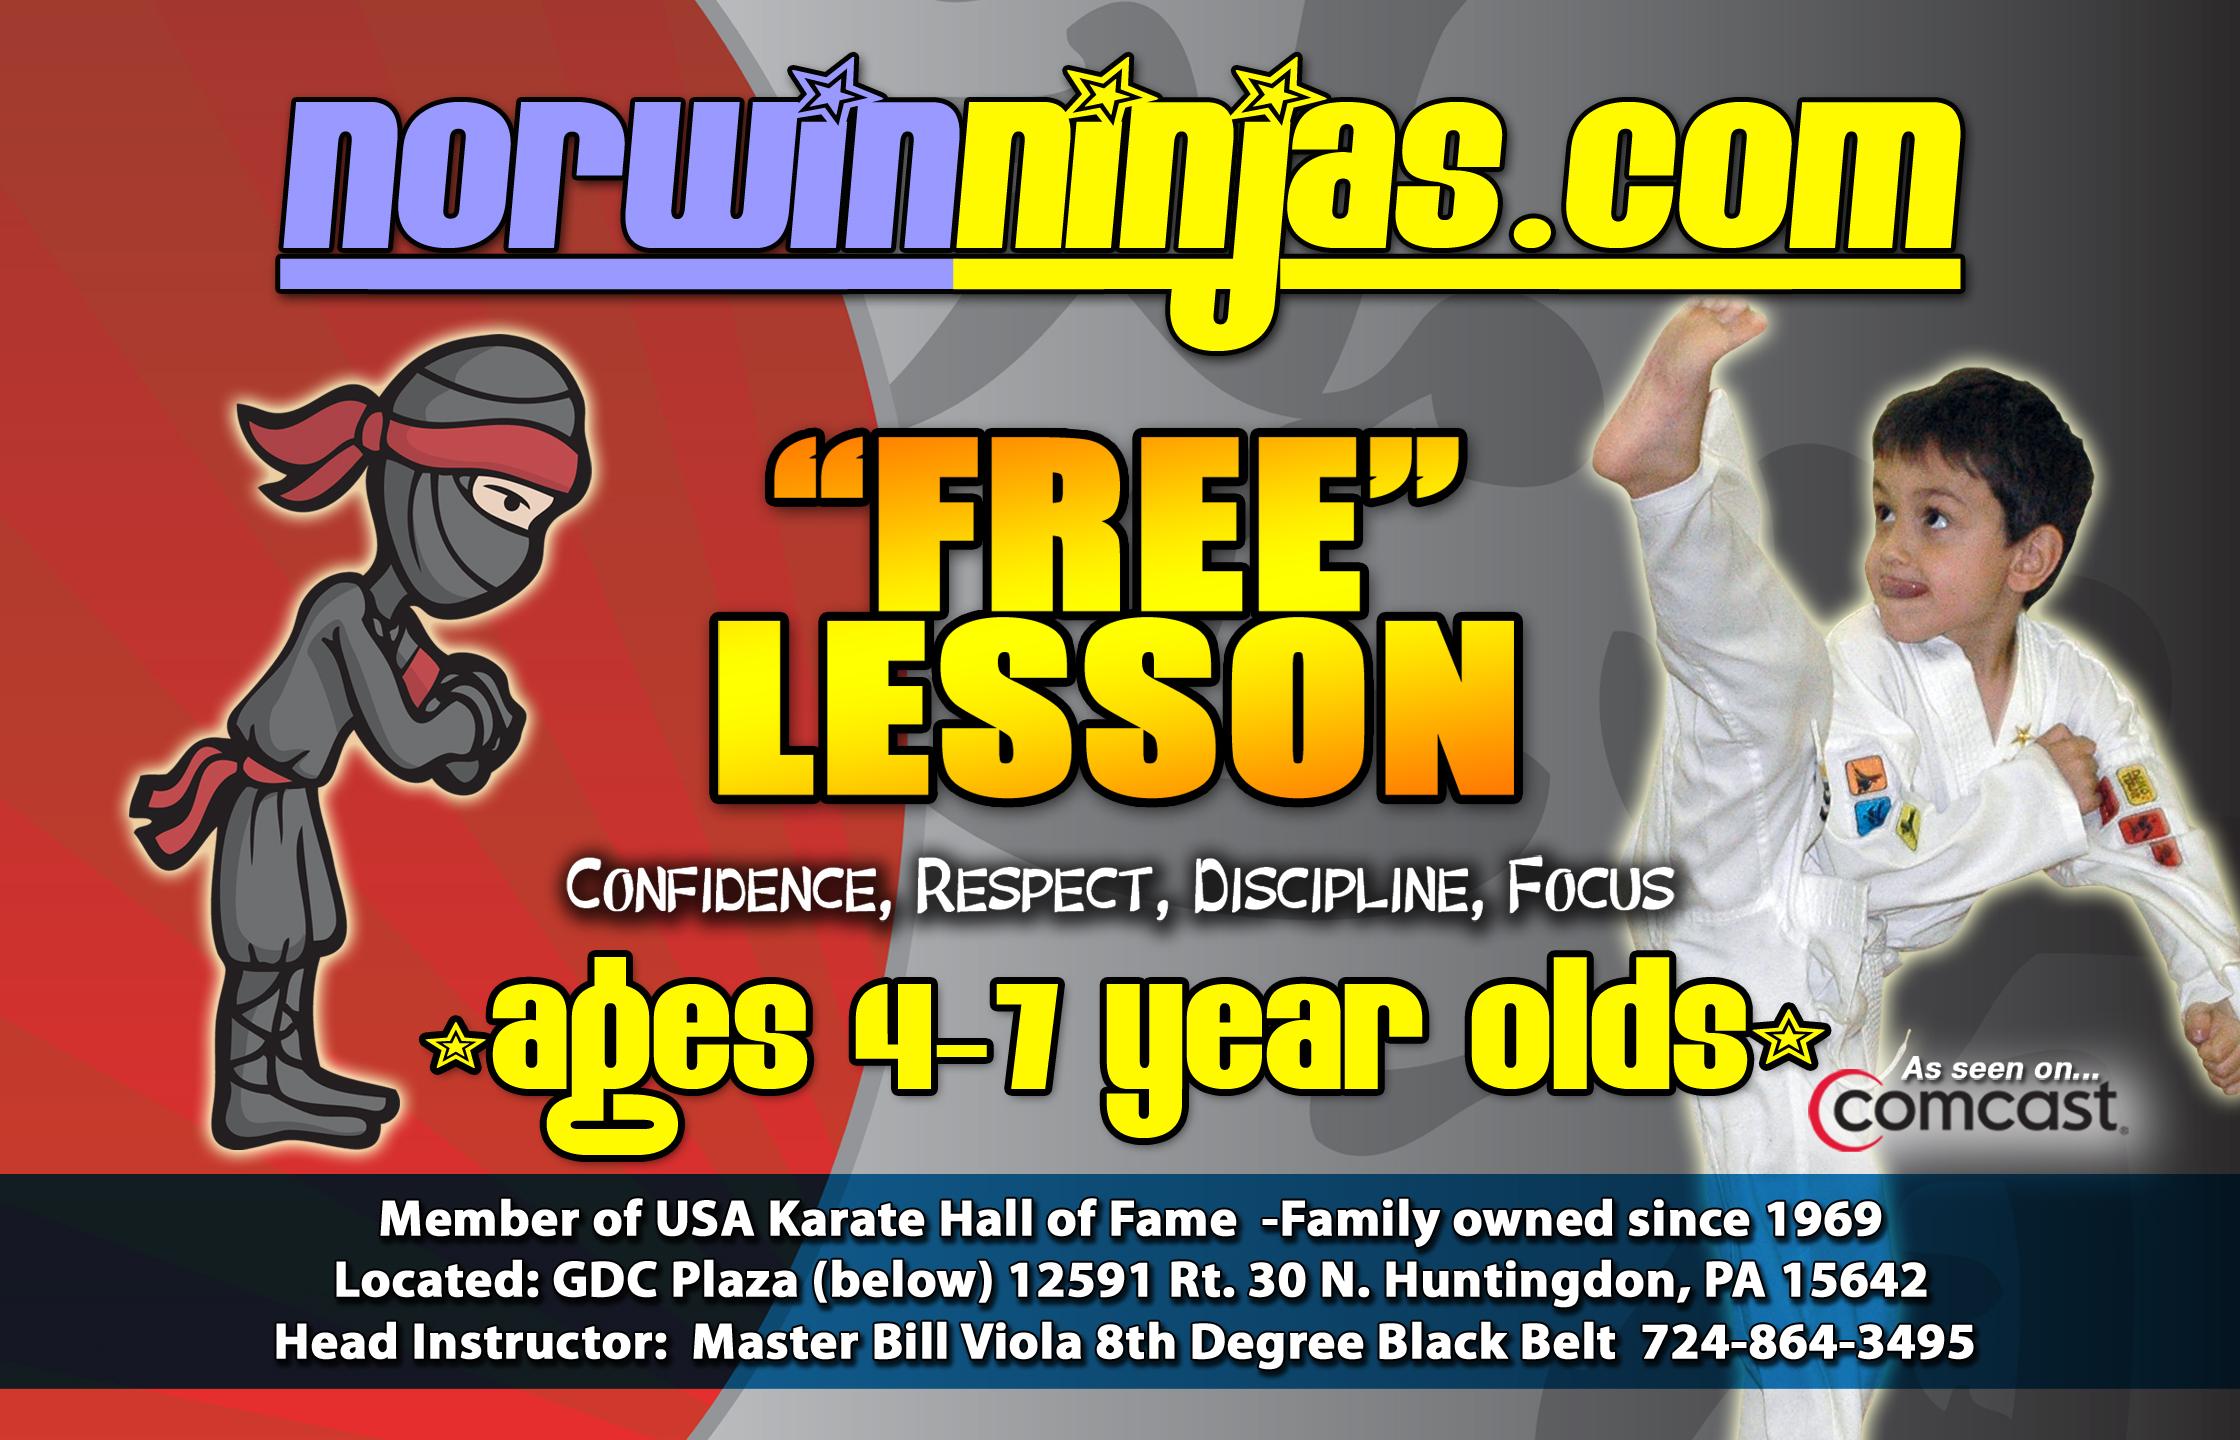 north huntingdon karate school coupon